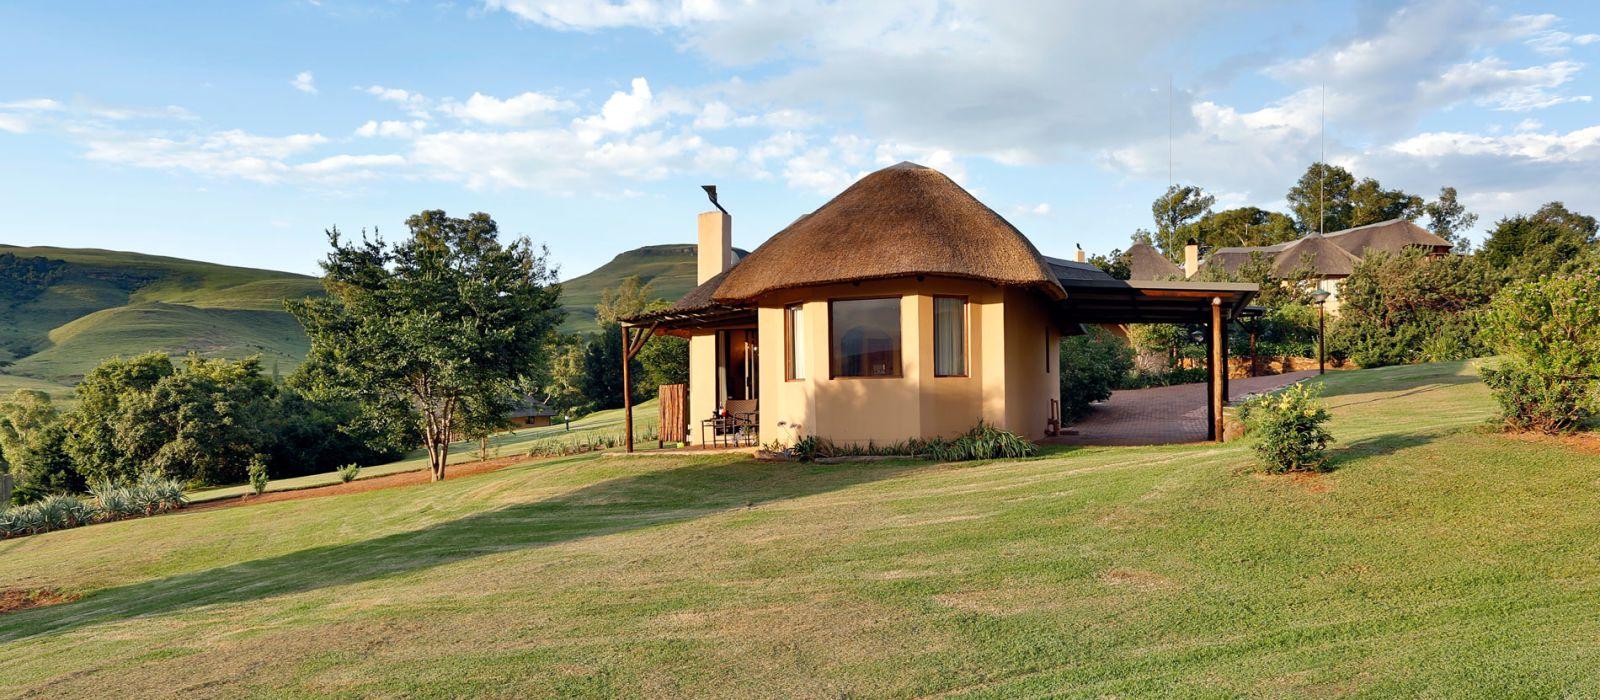 Hotel Montusi Mountain Lodge South Africa